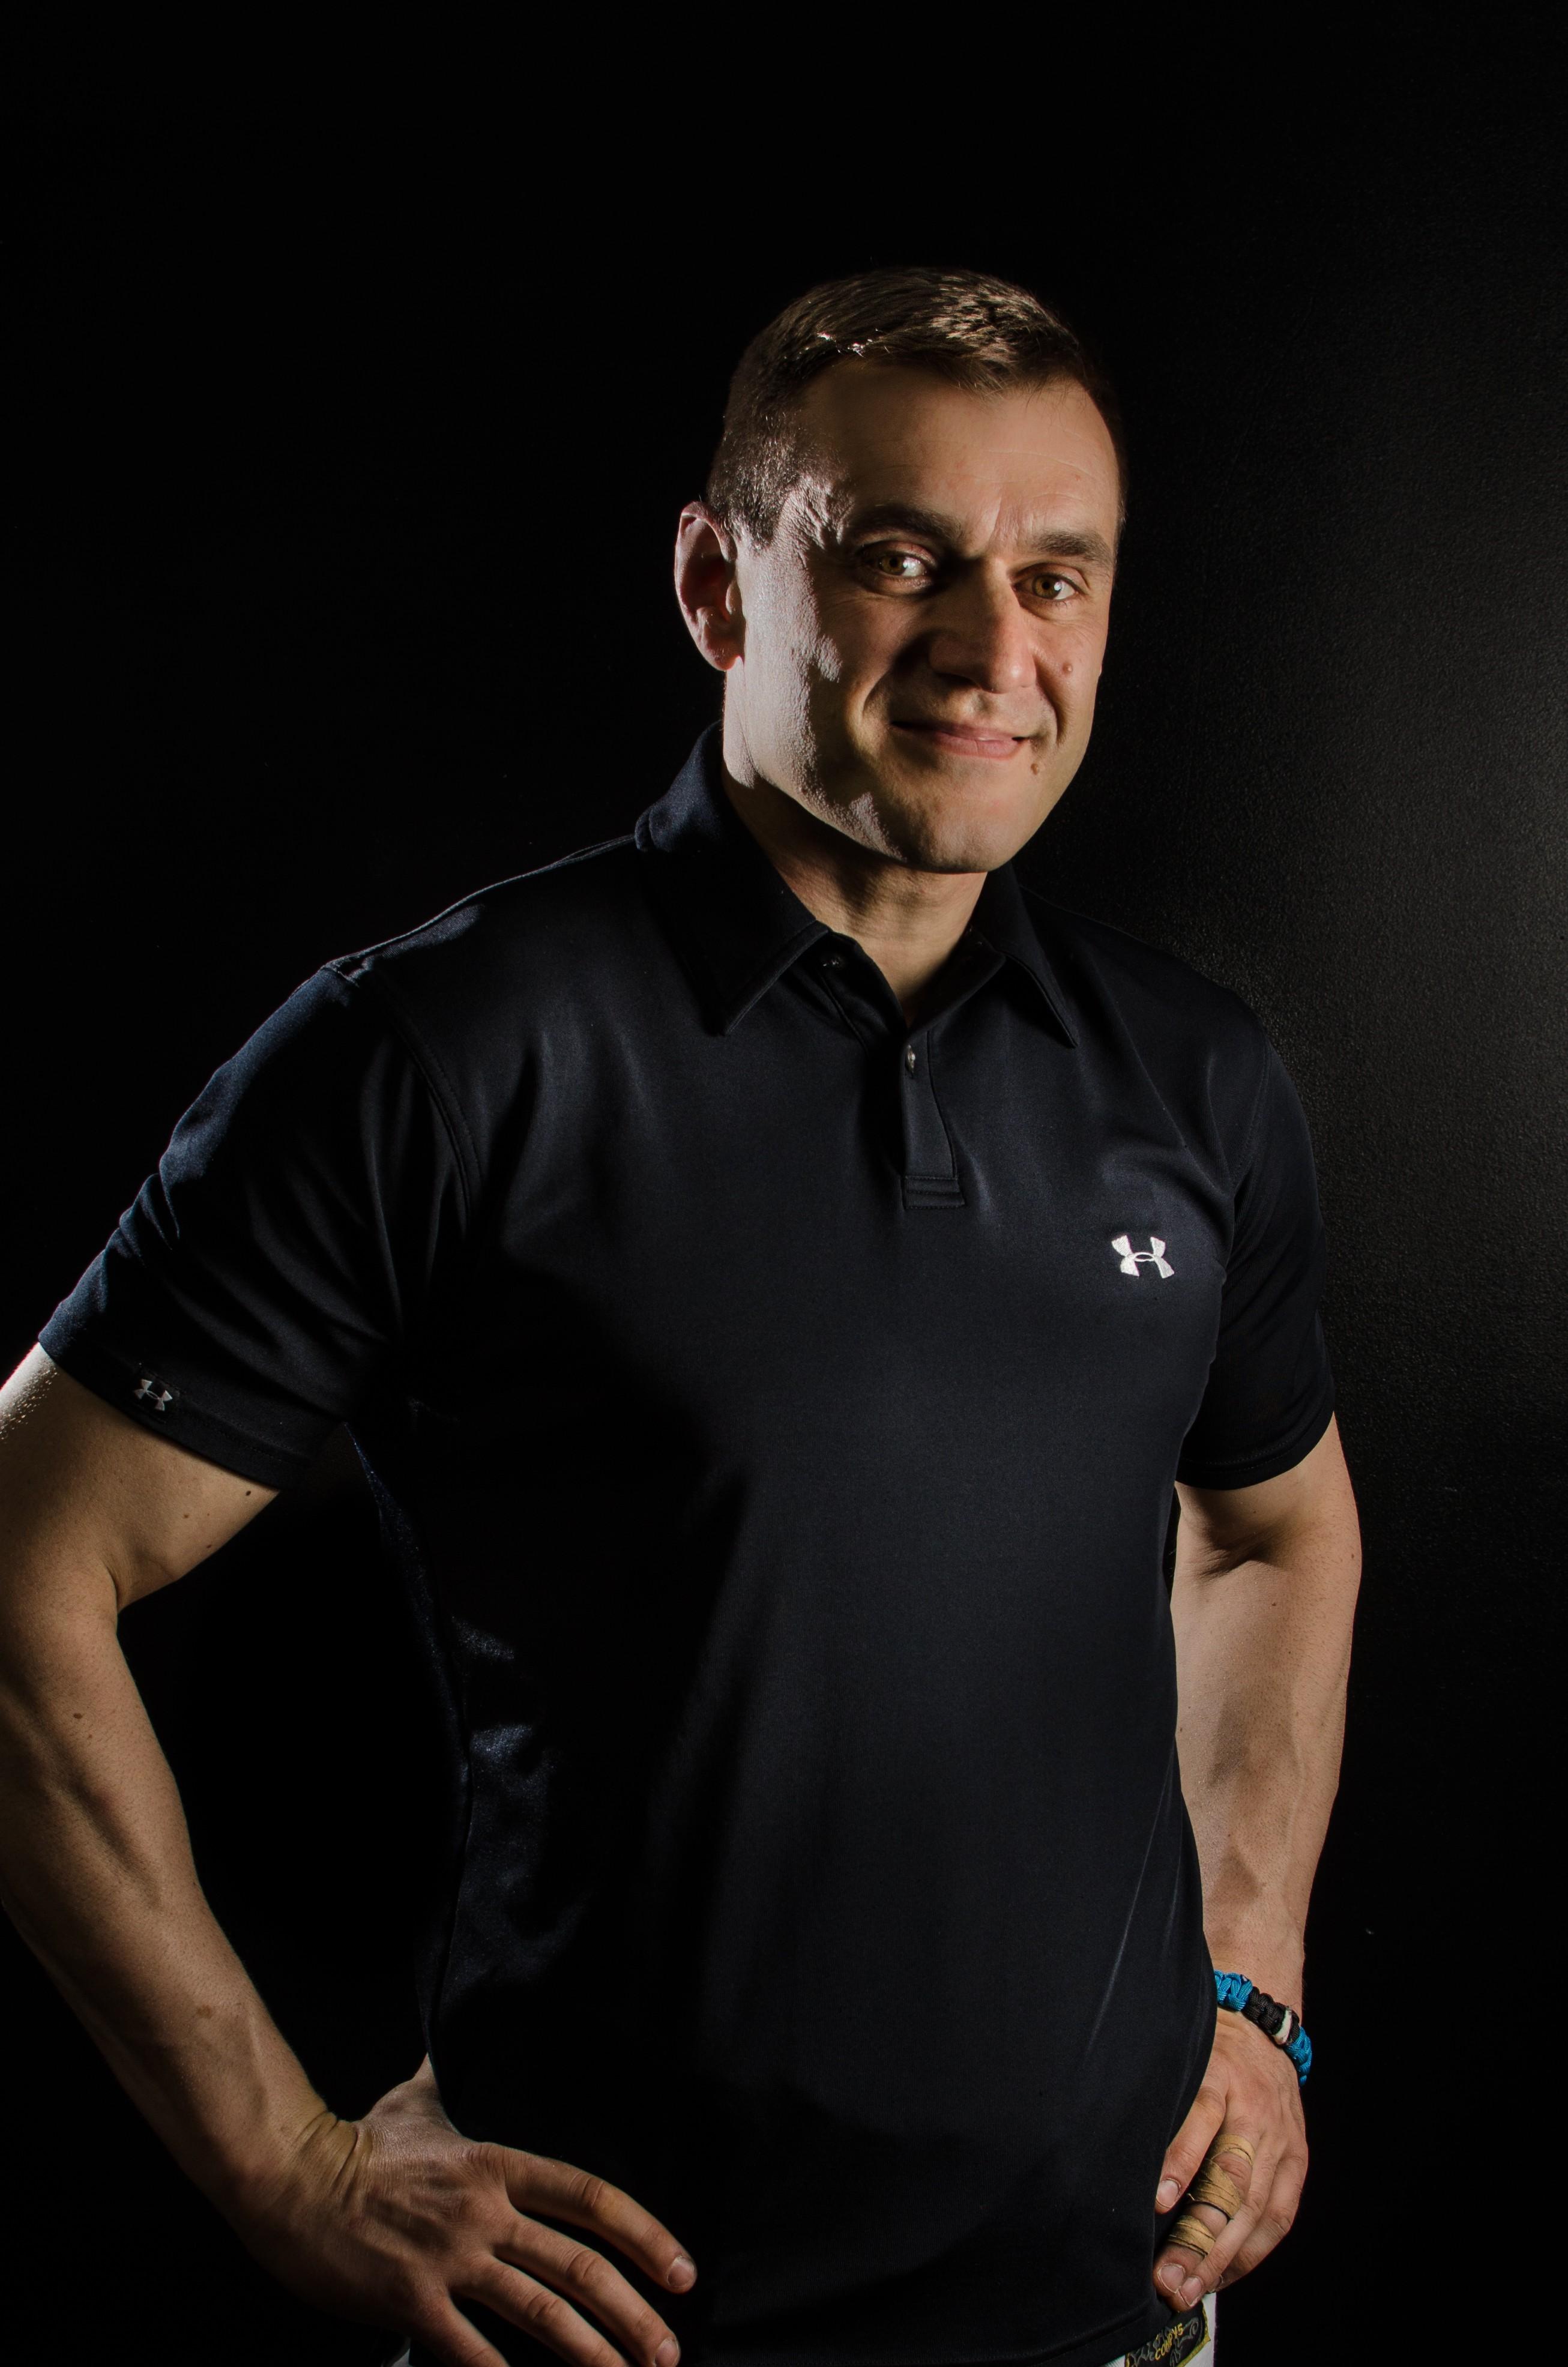 Greg Jasnikowski